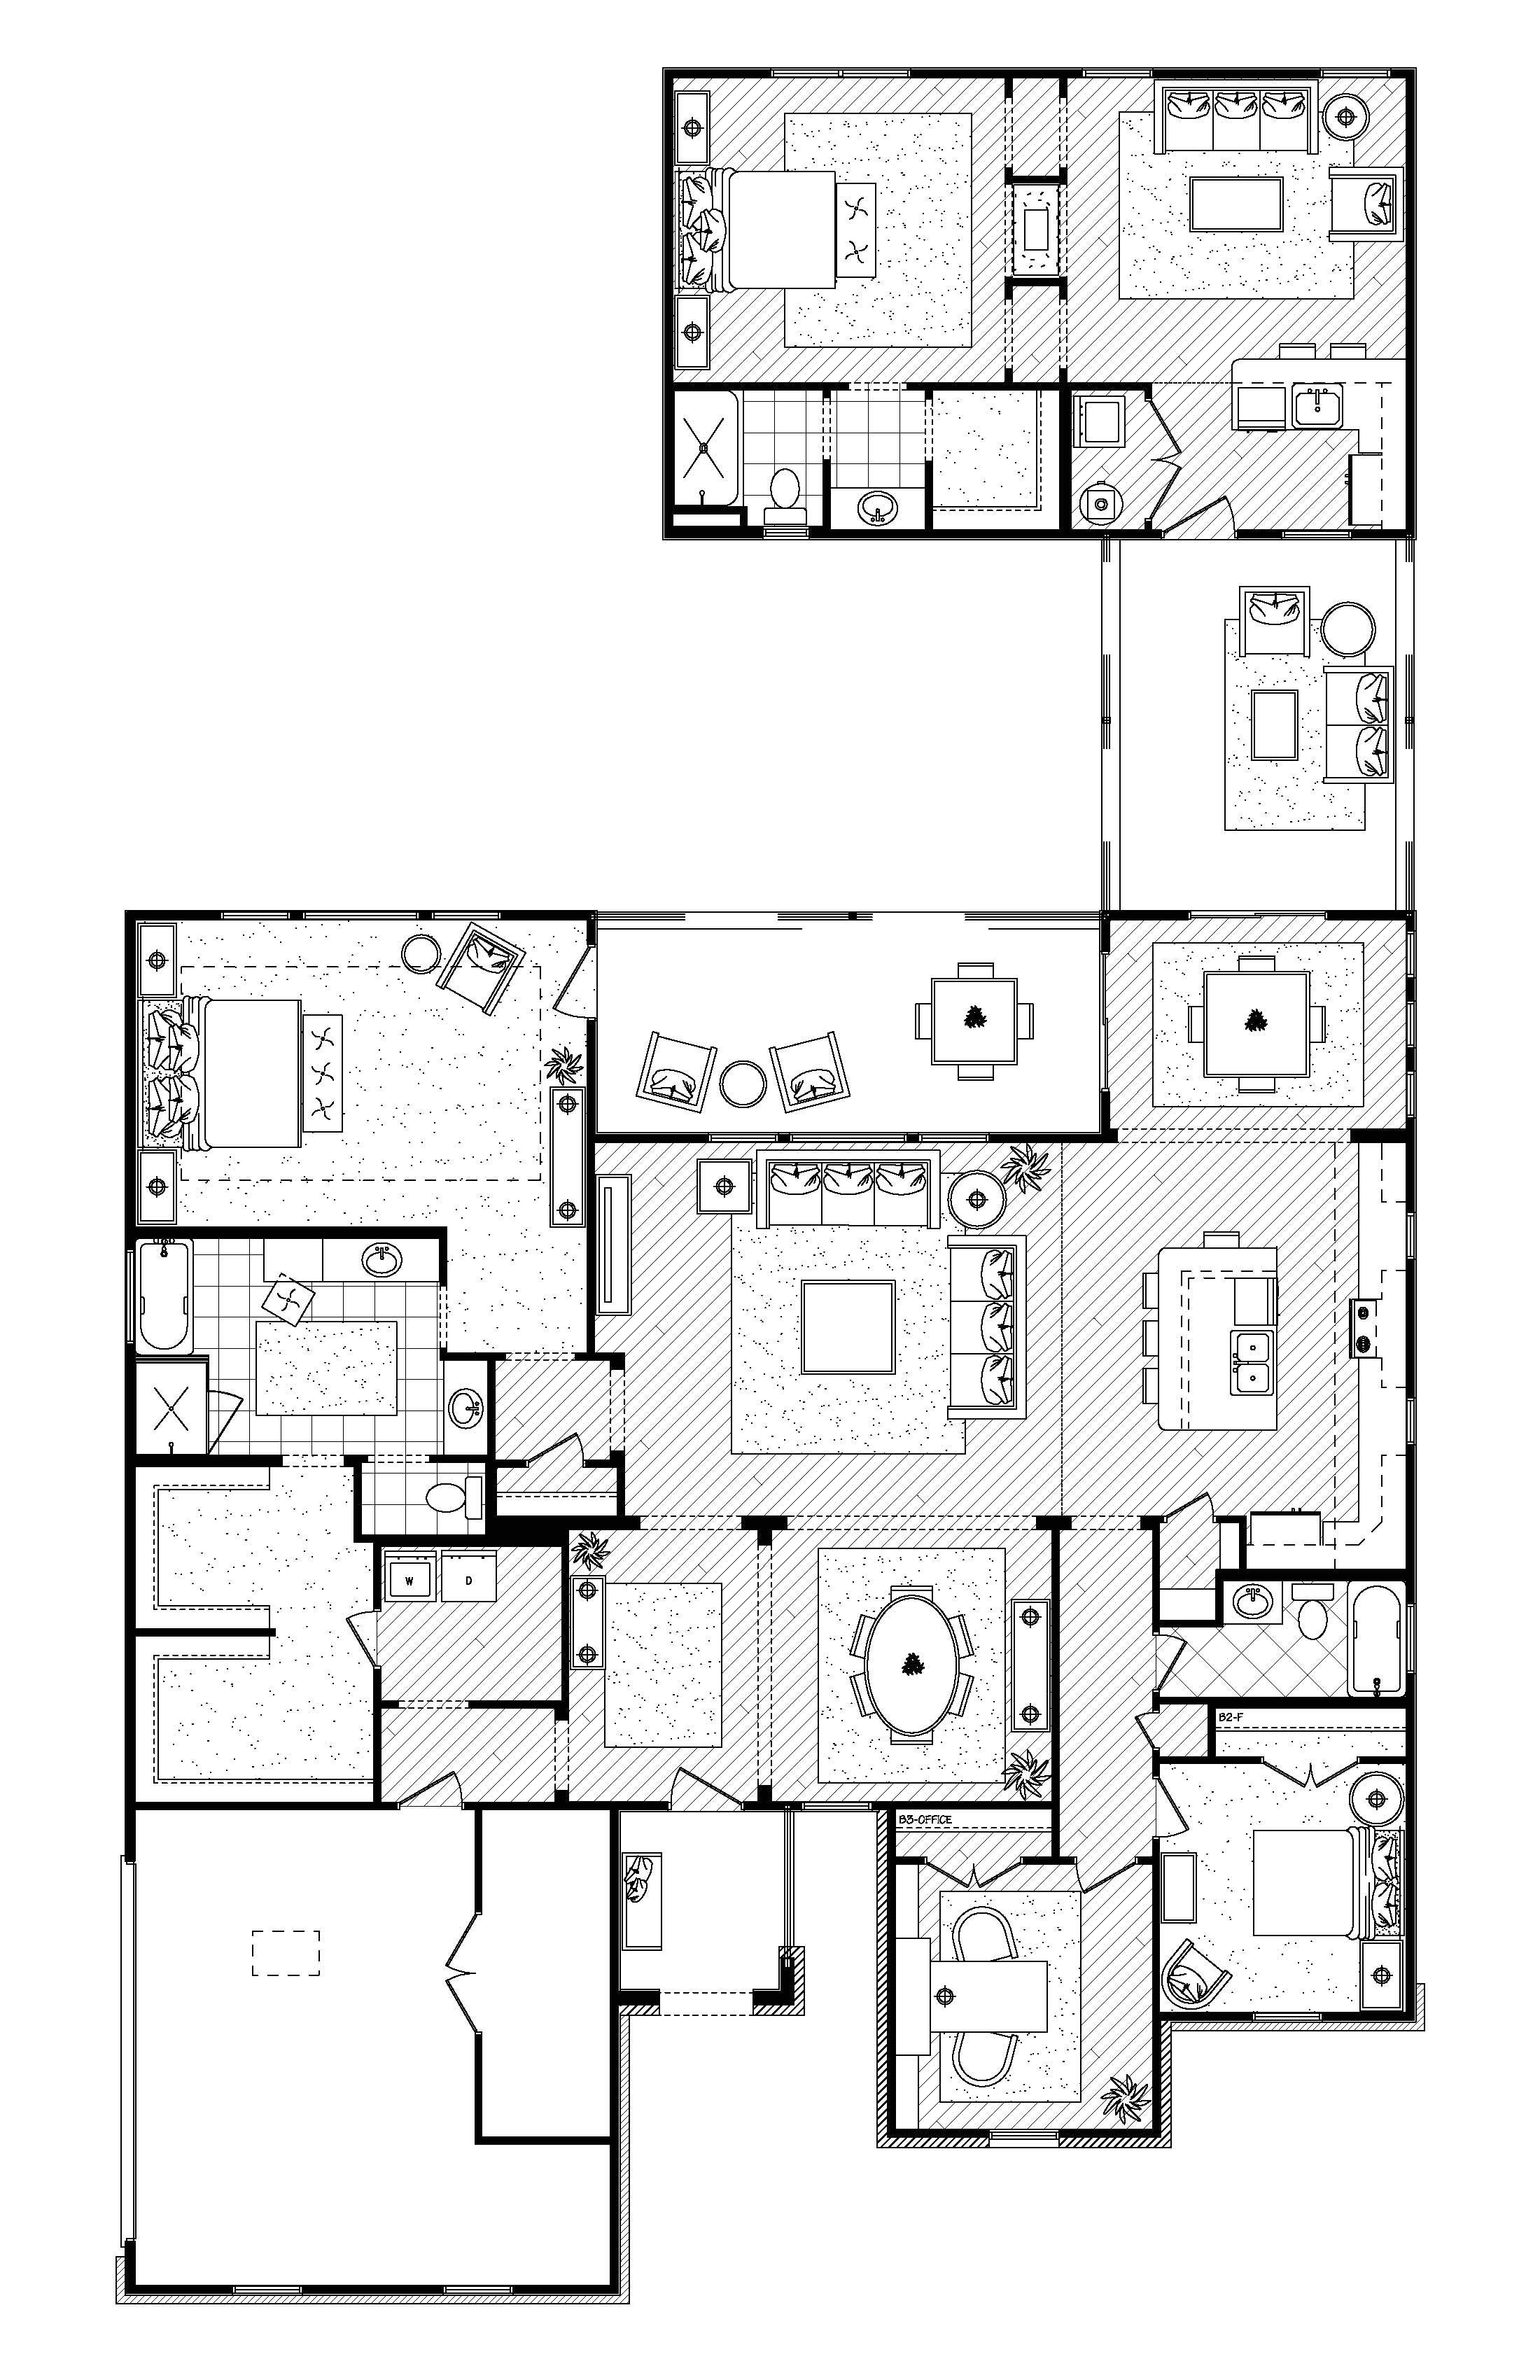 multi generational home plans australia luxury multi generational home brankoirade home plans australia floor